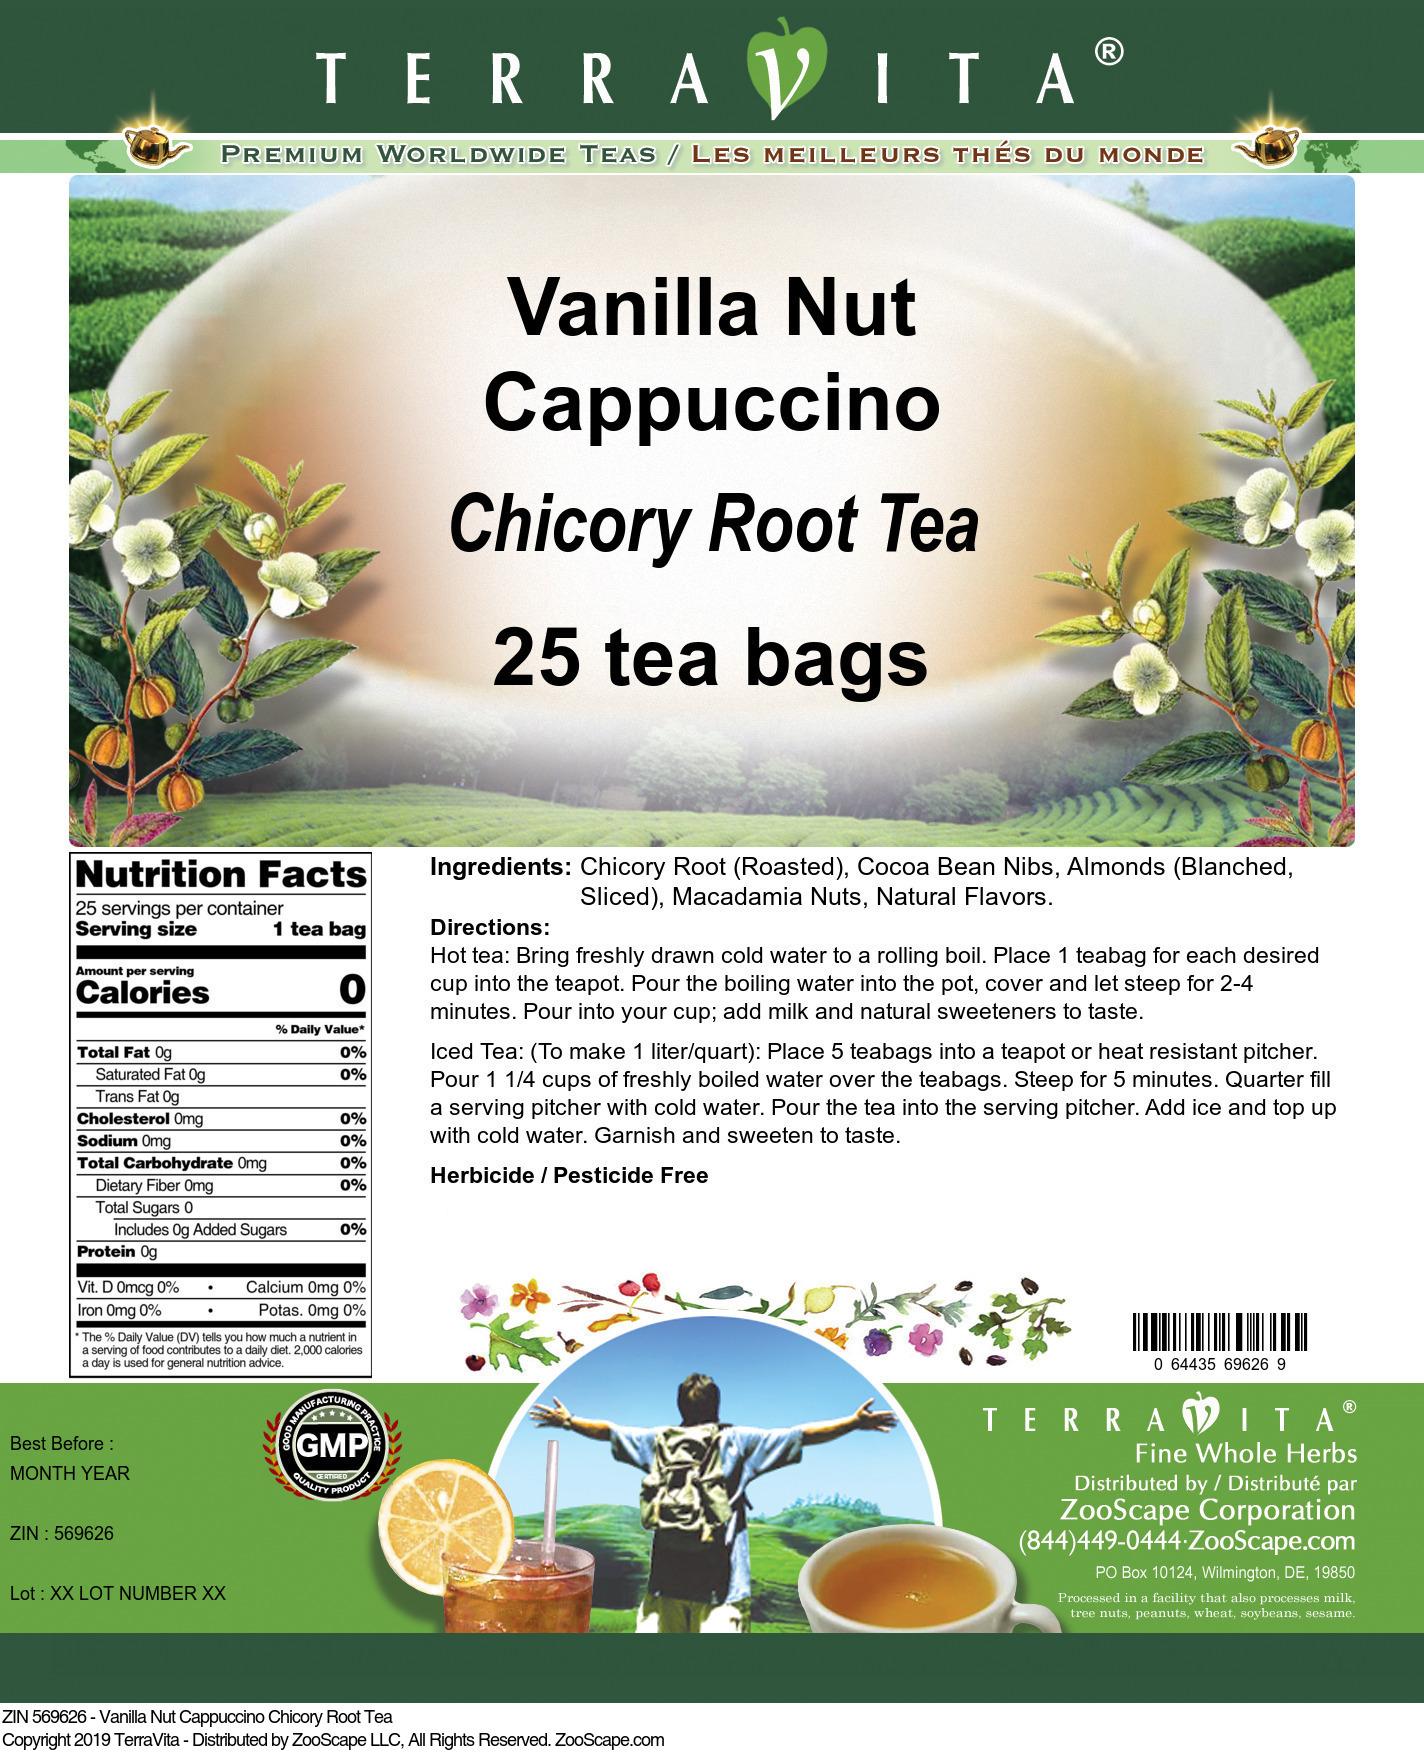 Vanilla Nut Cappuccino Chicory Root Tea